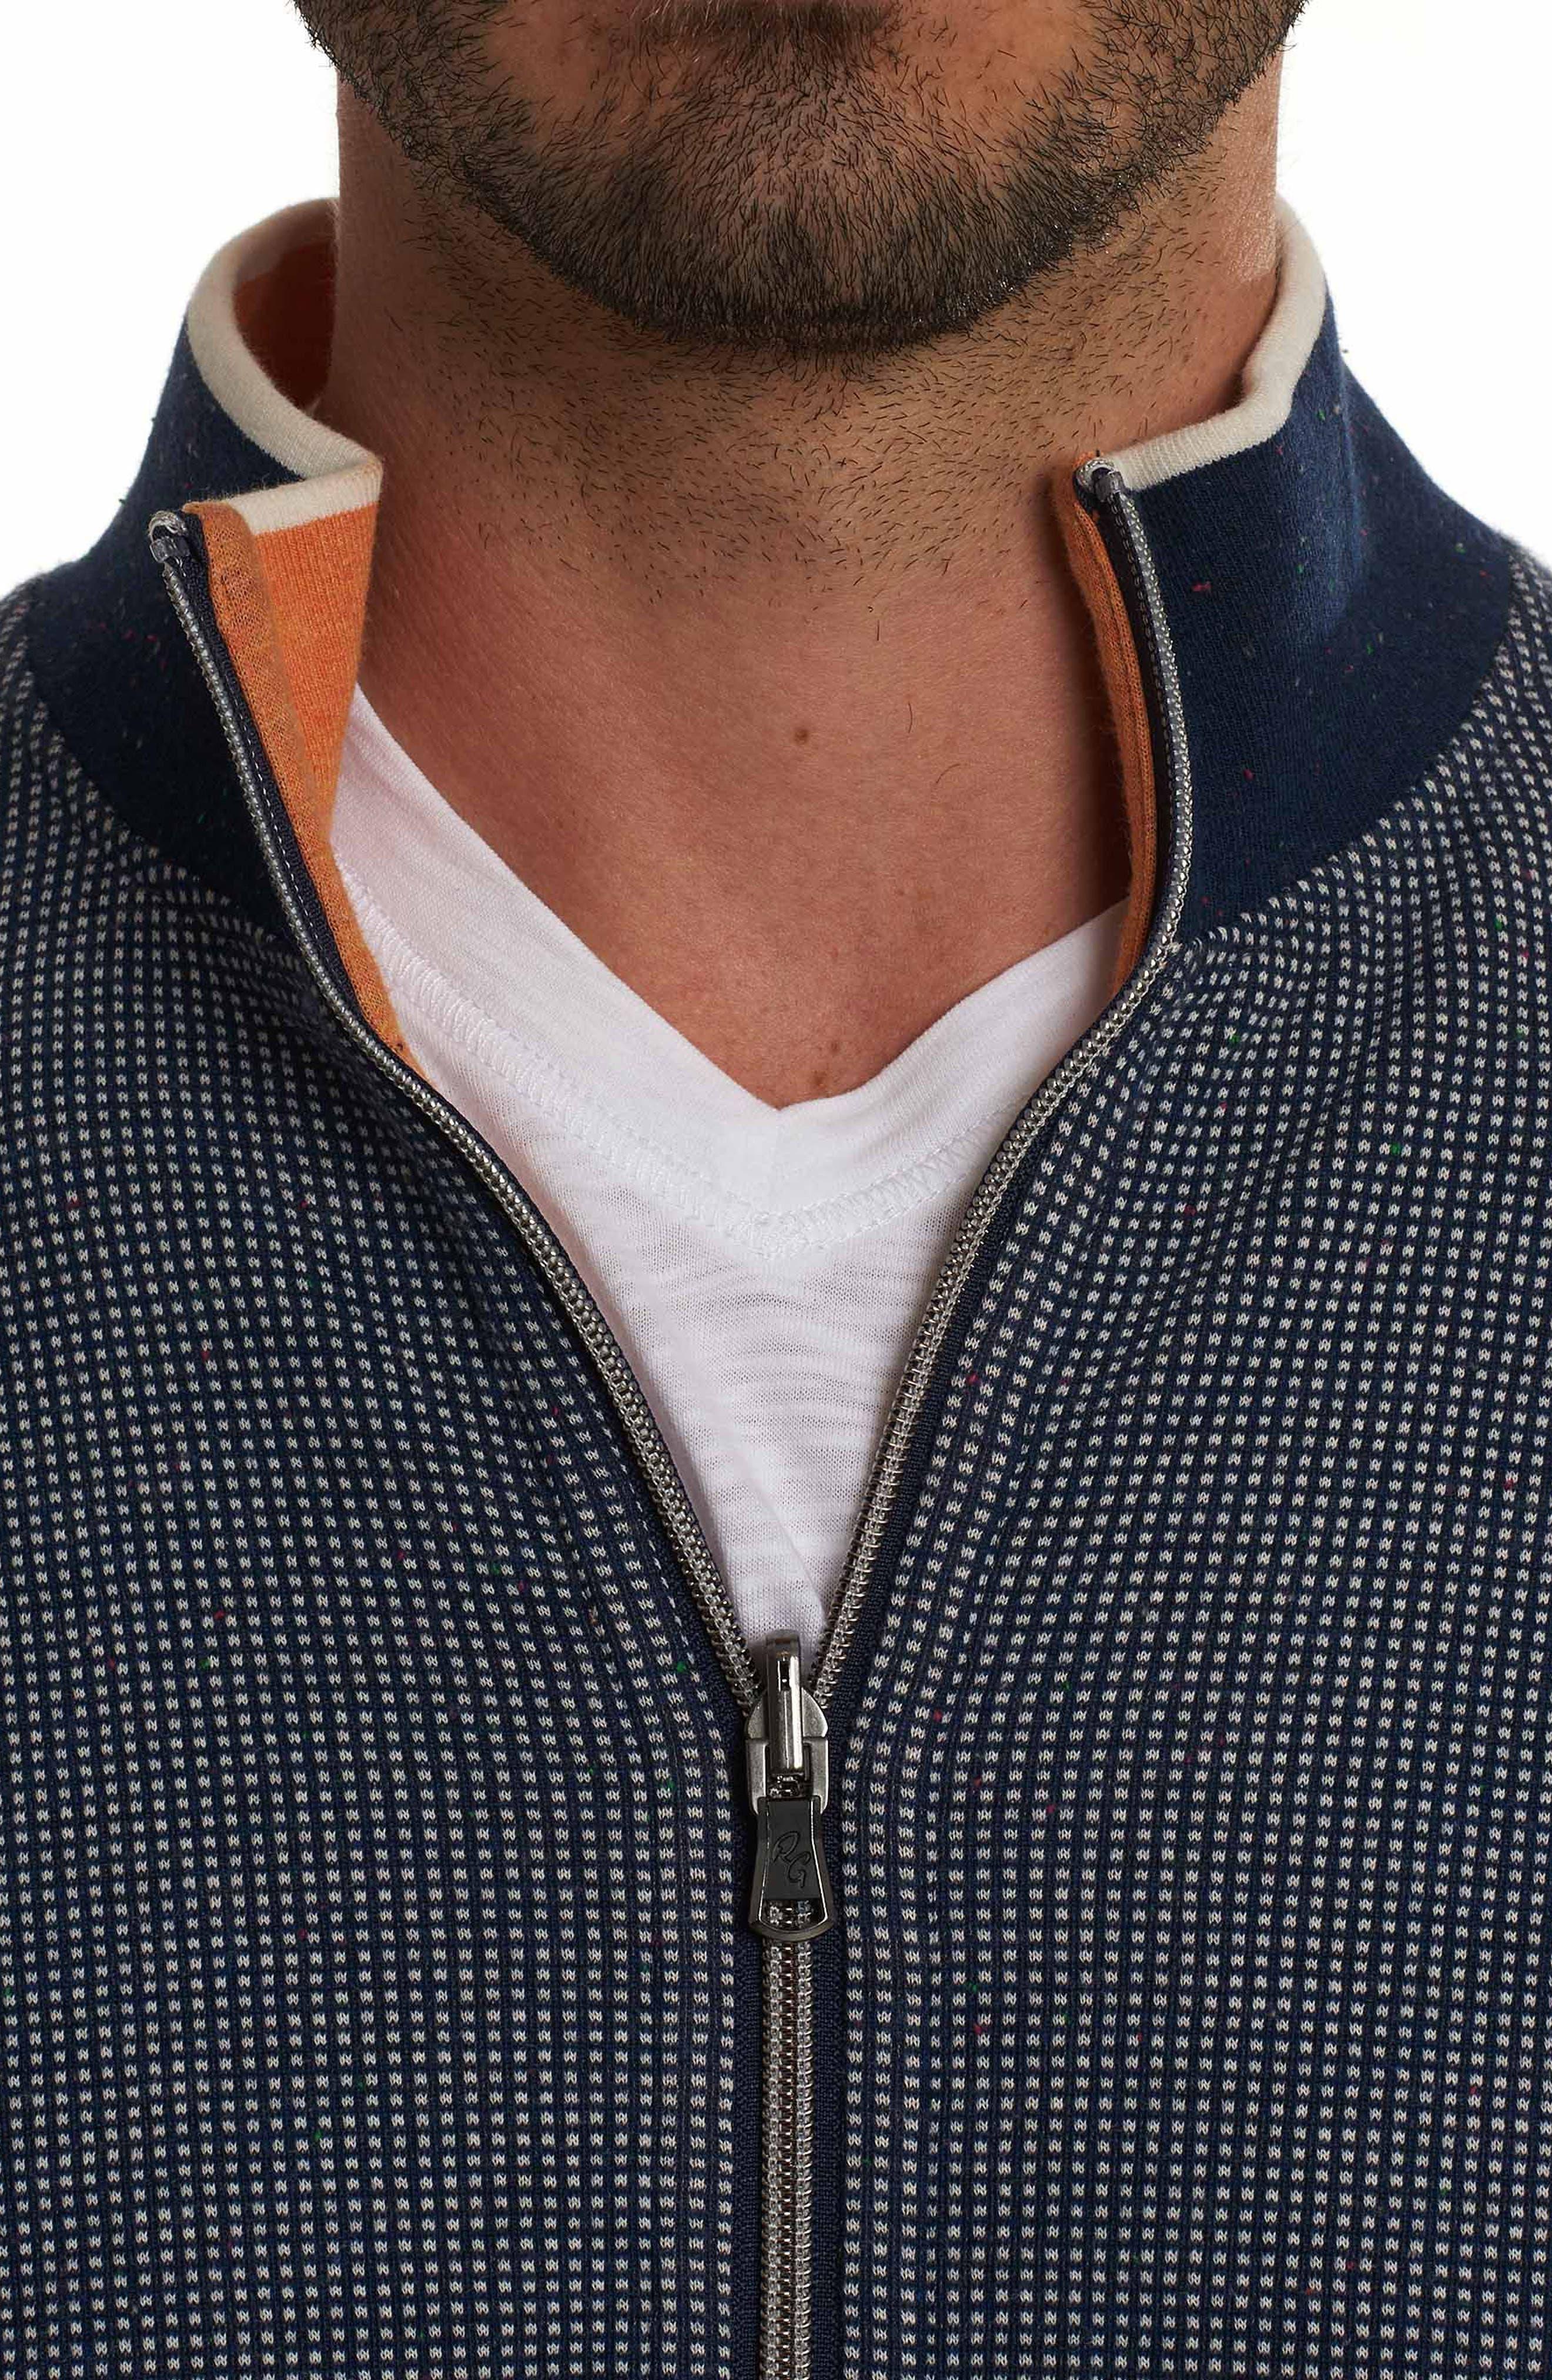 Rivers Front Zip Knit Jacket,                             Alternate thumbnail 3, color,                             410